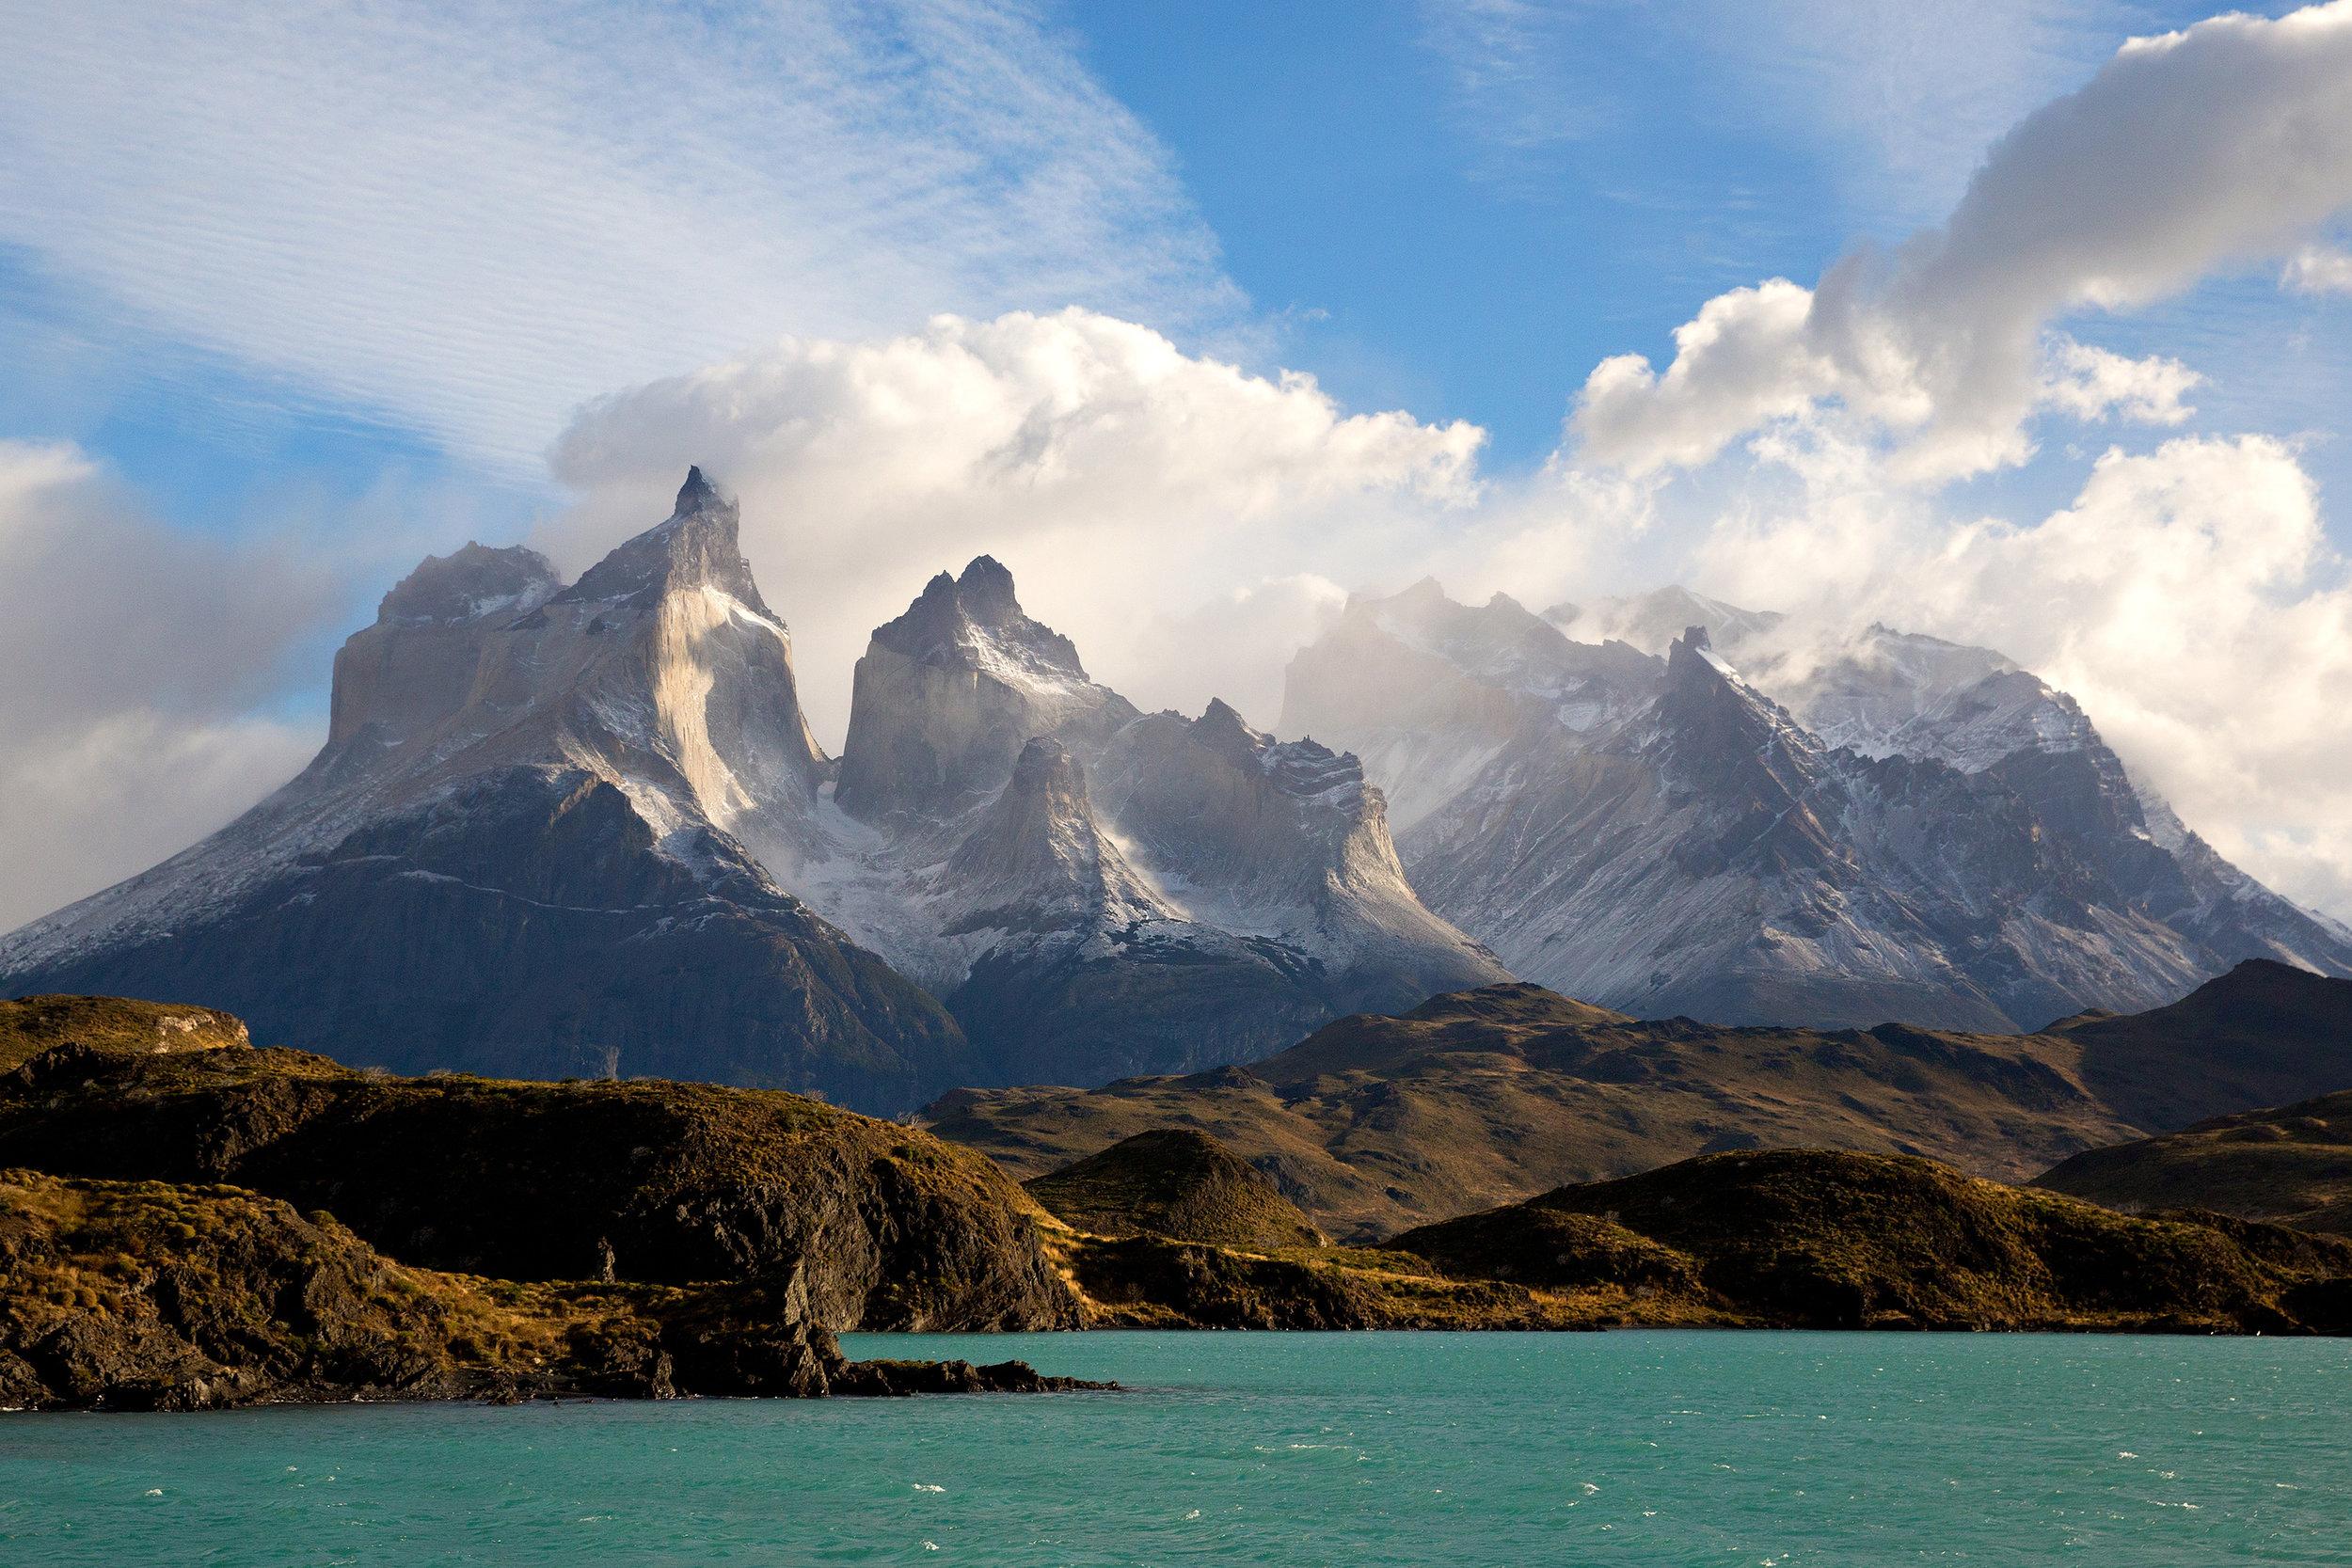 torres-del-paine-national-park-patagonia.jpg